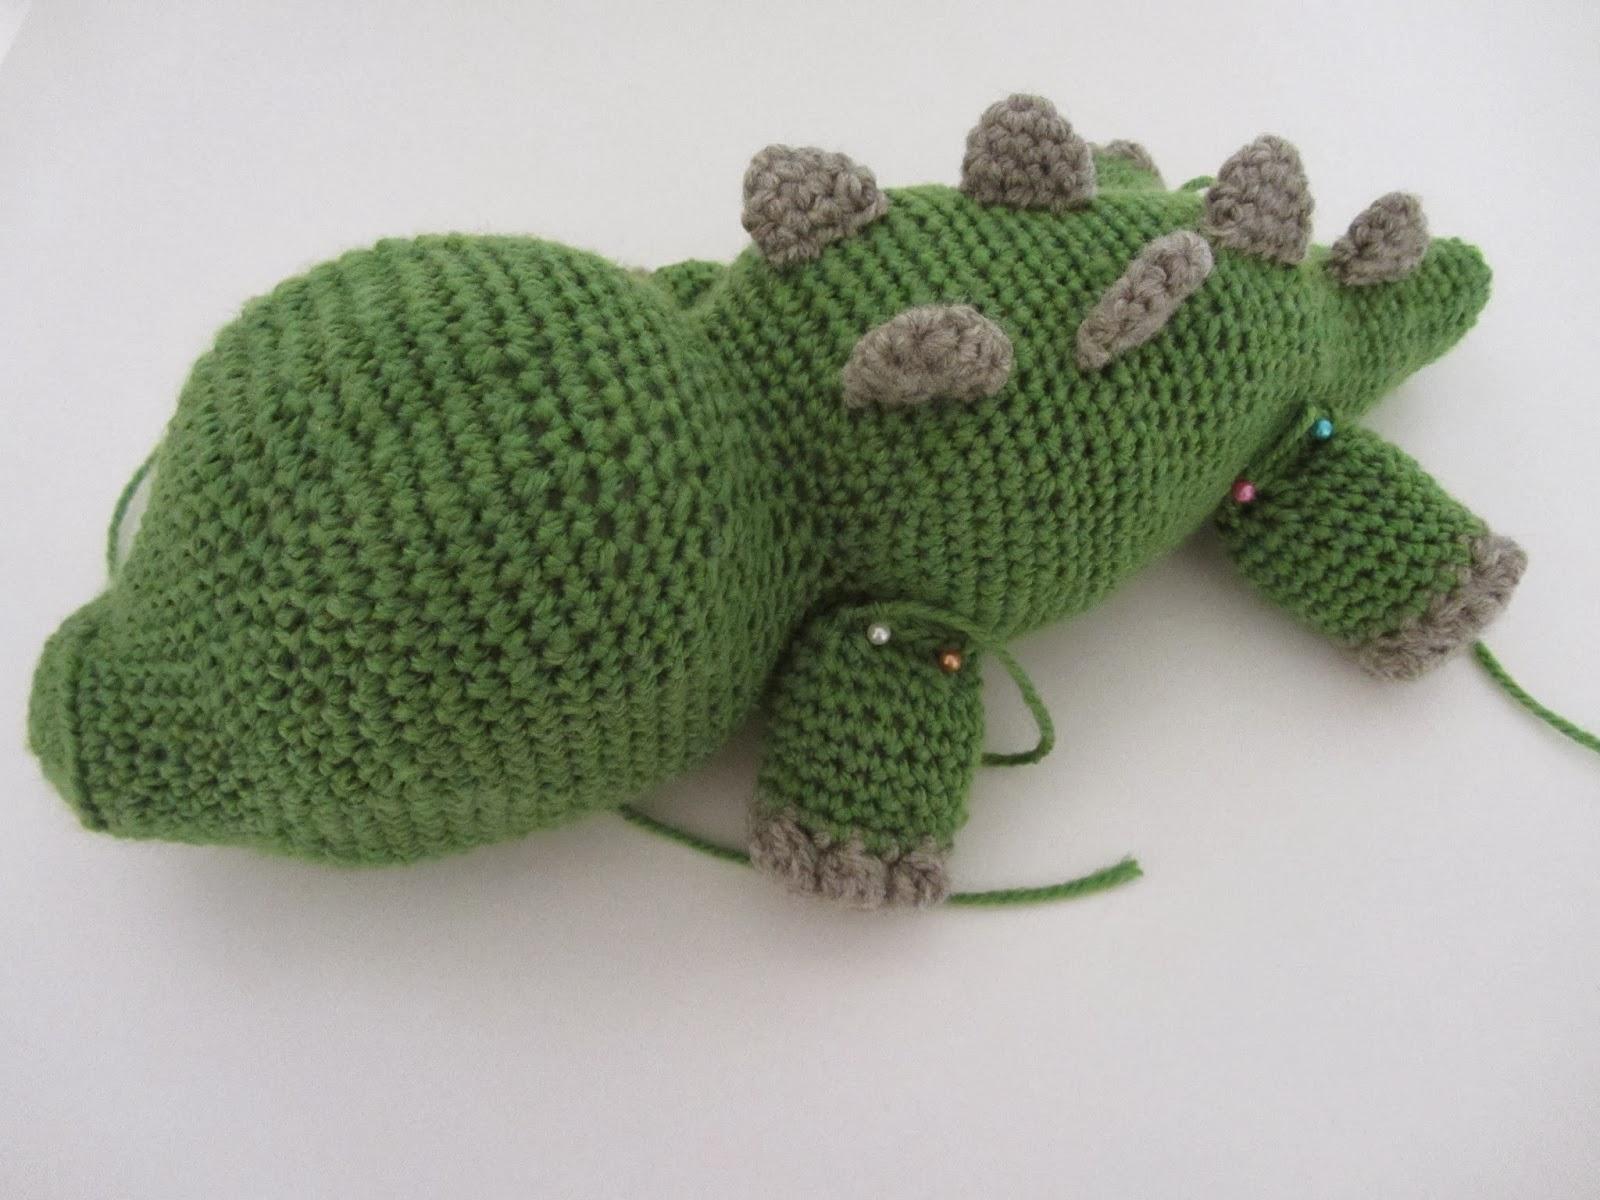 L(i)ebenswelt: Amigurumi Konrad das Krokodil